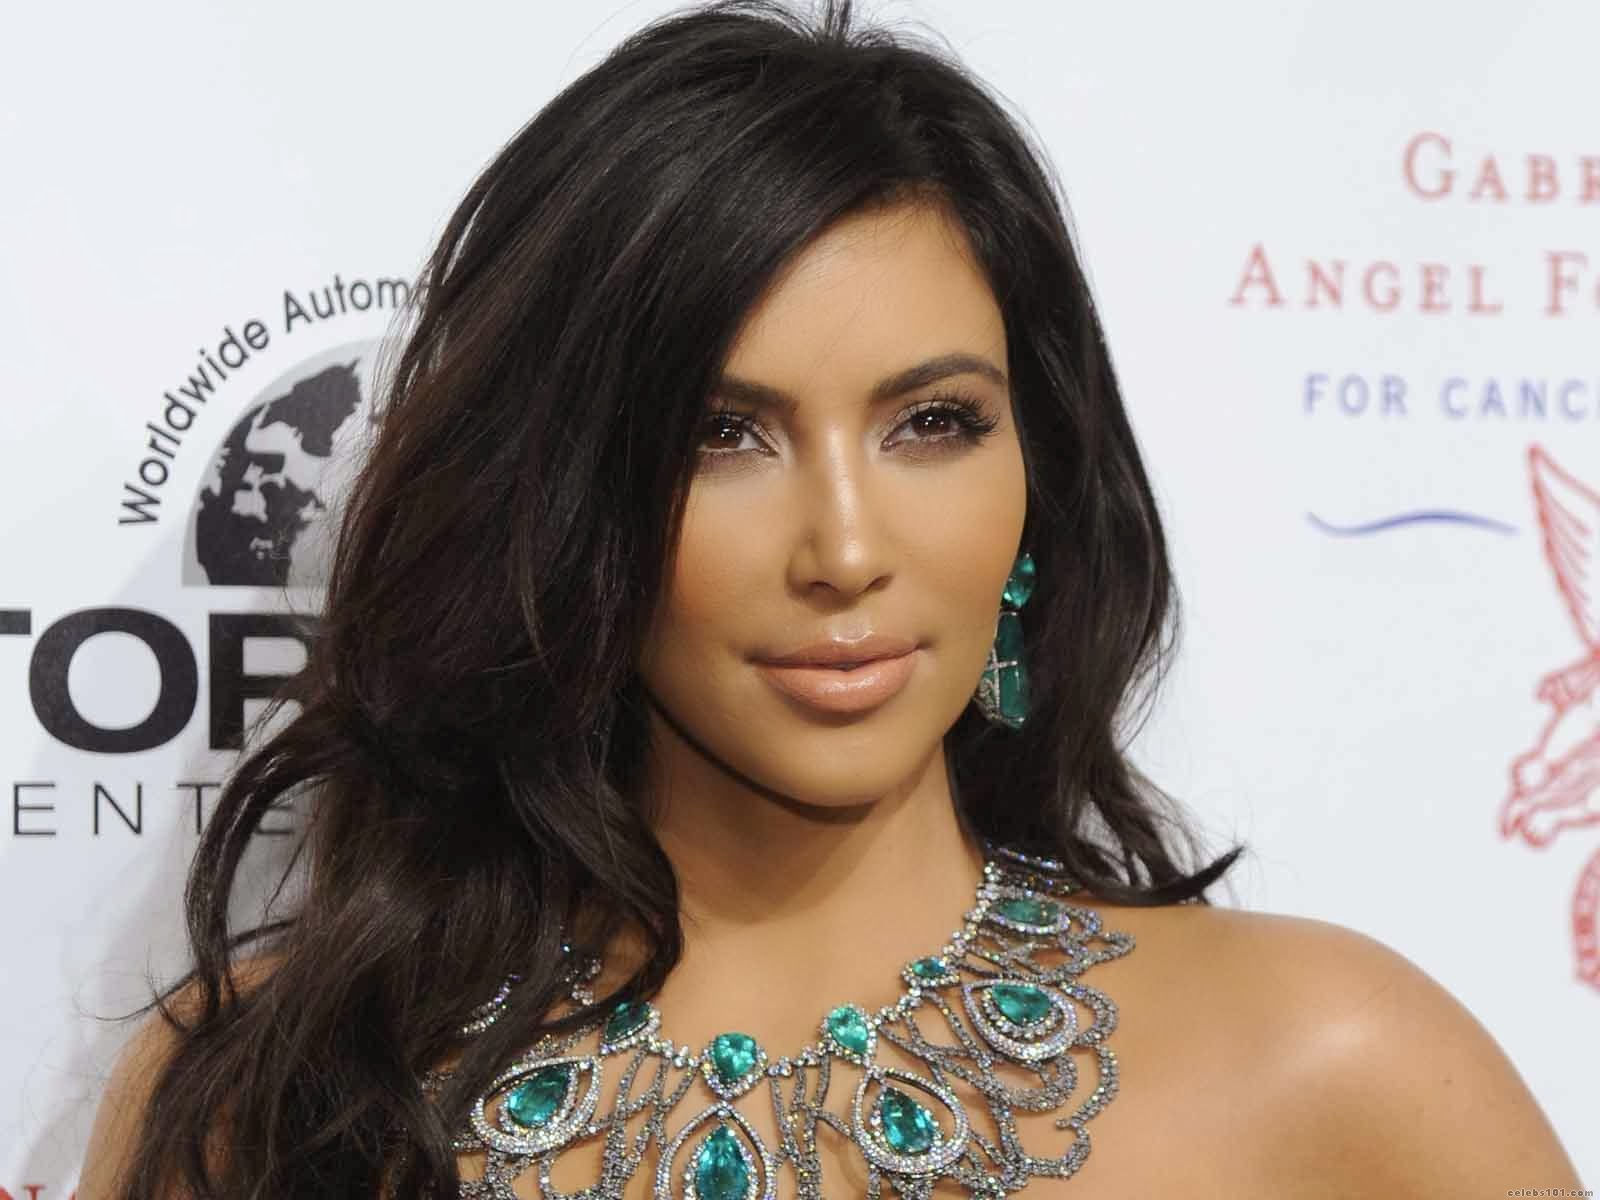 STARS WALLPAPER Kim Kardashian HD Wallpapers Download 1600x1200